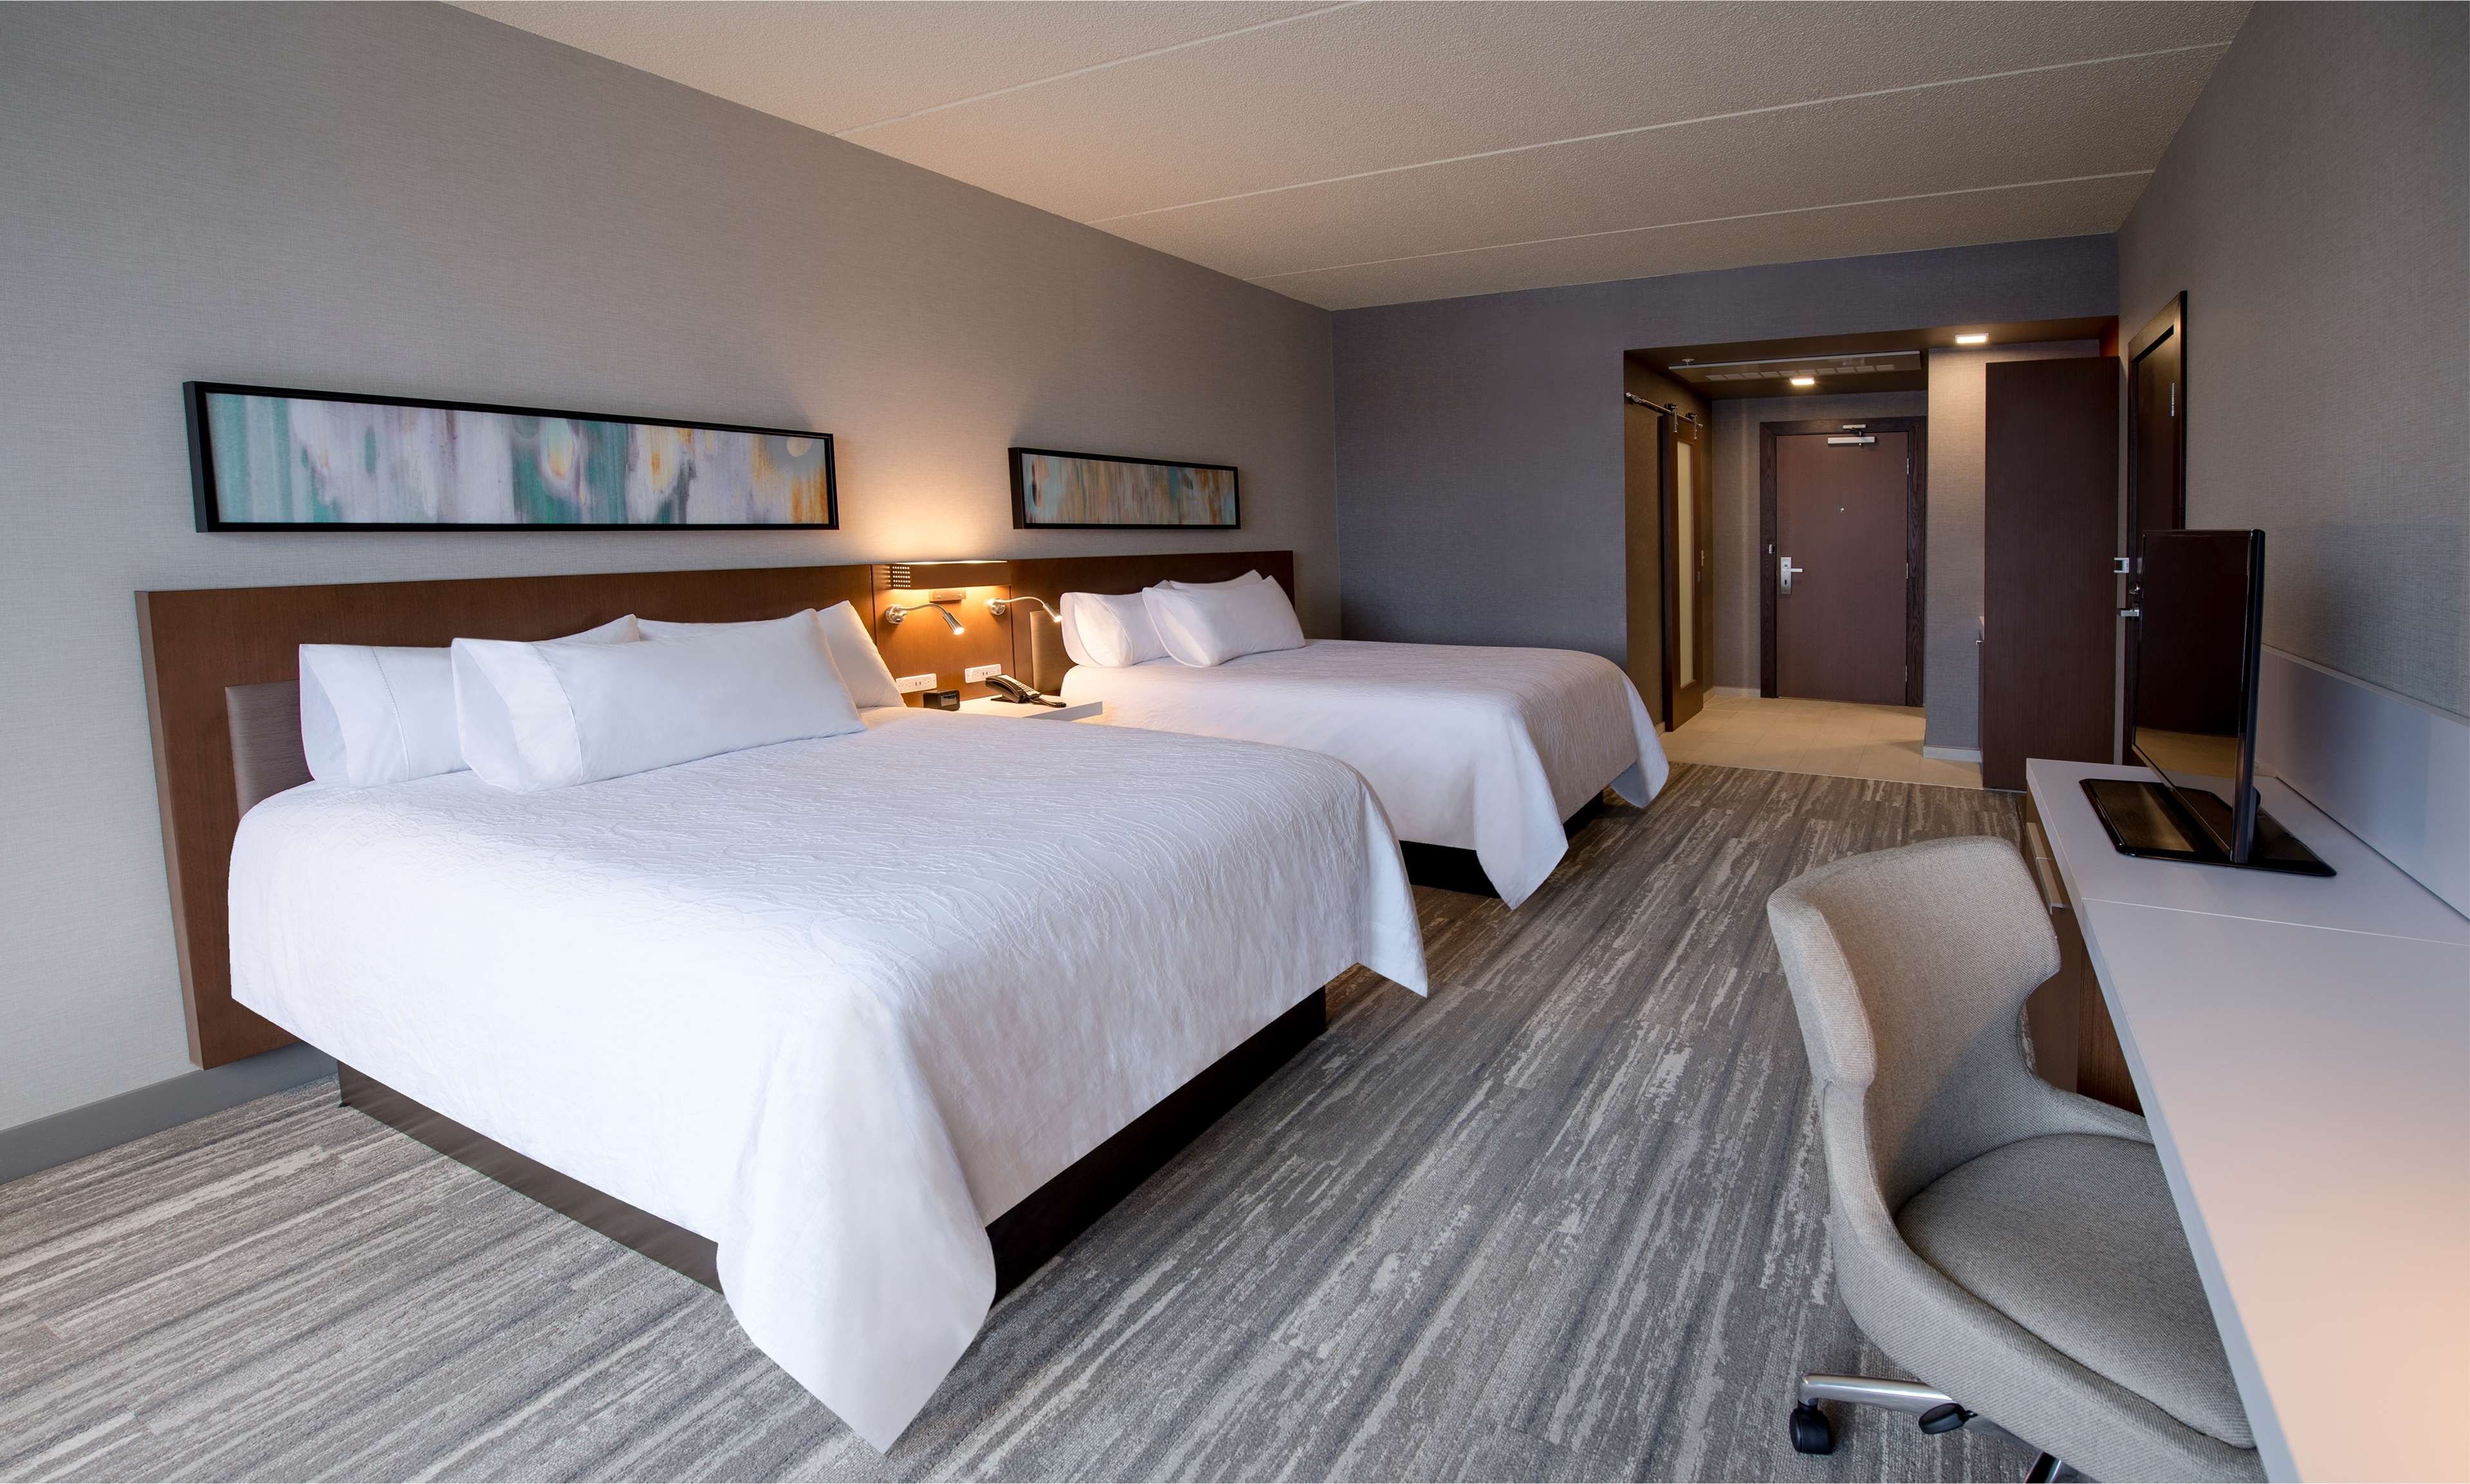 Hilton Garden Inn Wausau image 10